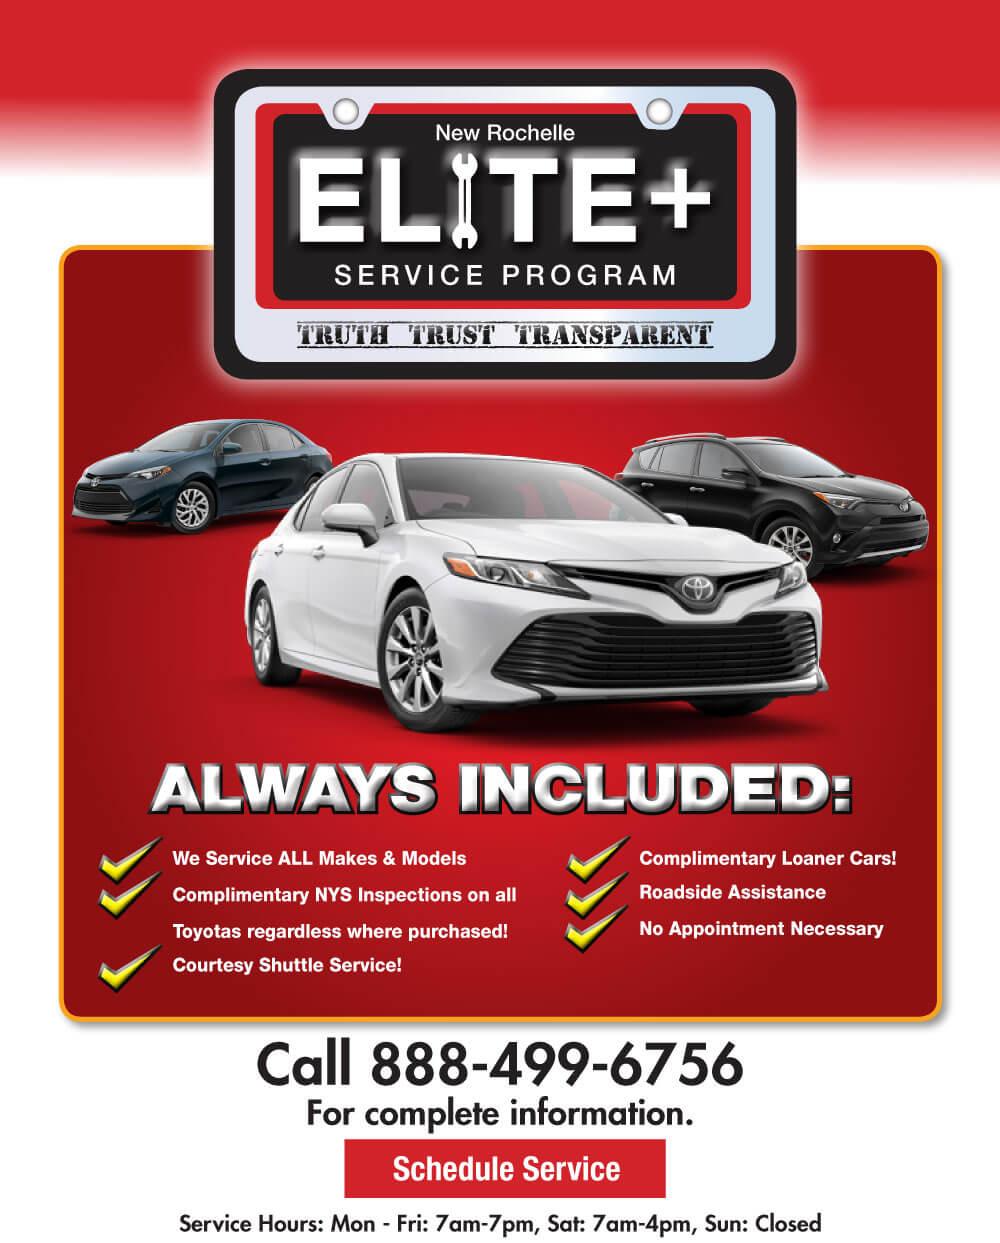 Elite Service Program, New Rochelle Toyota